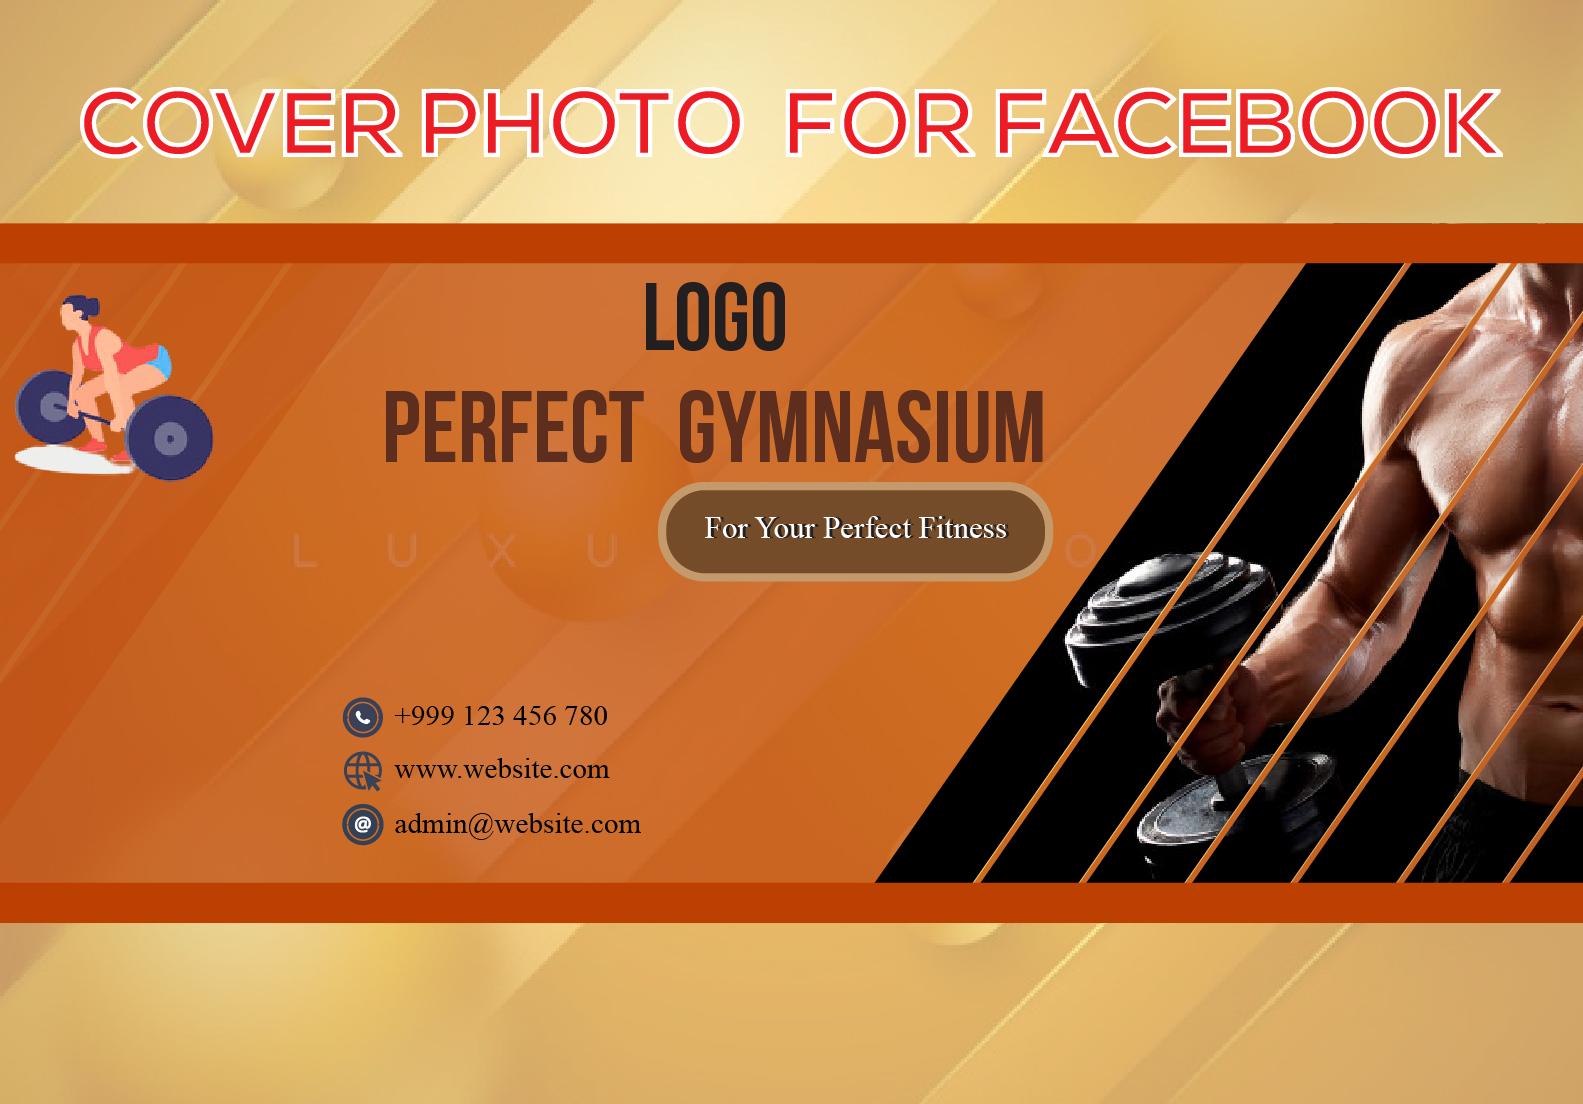 Professional Design For Facebook/Instragram/twitter Cover Photo Banner